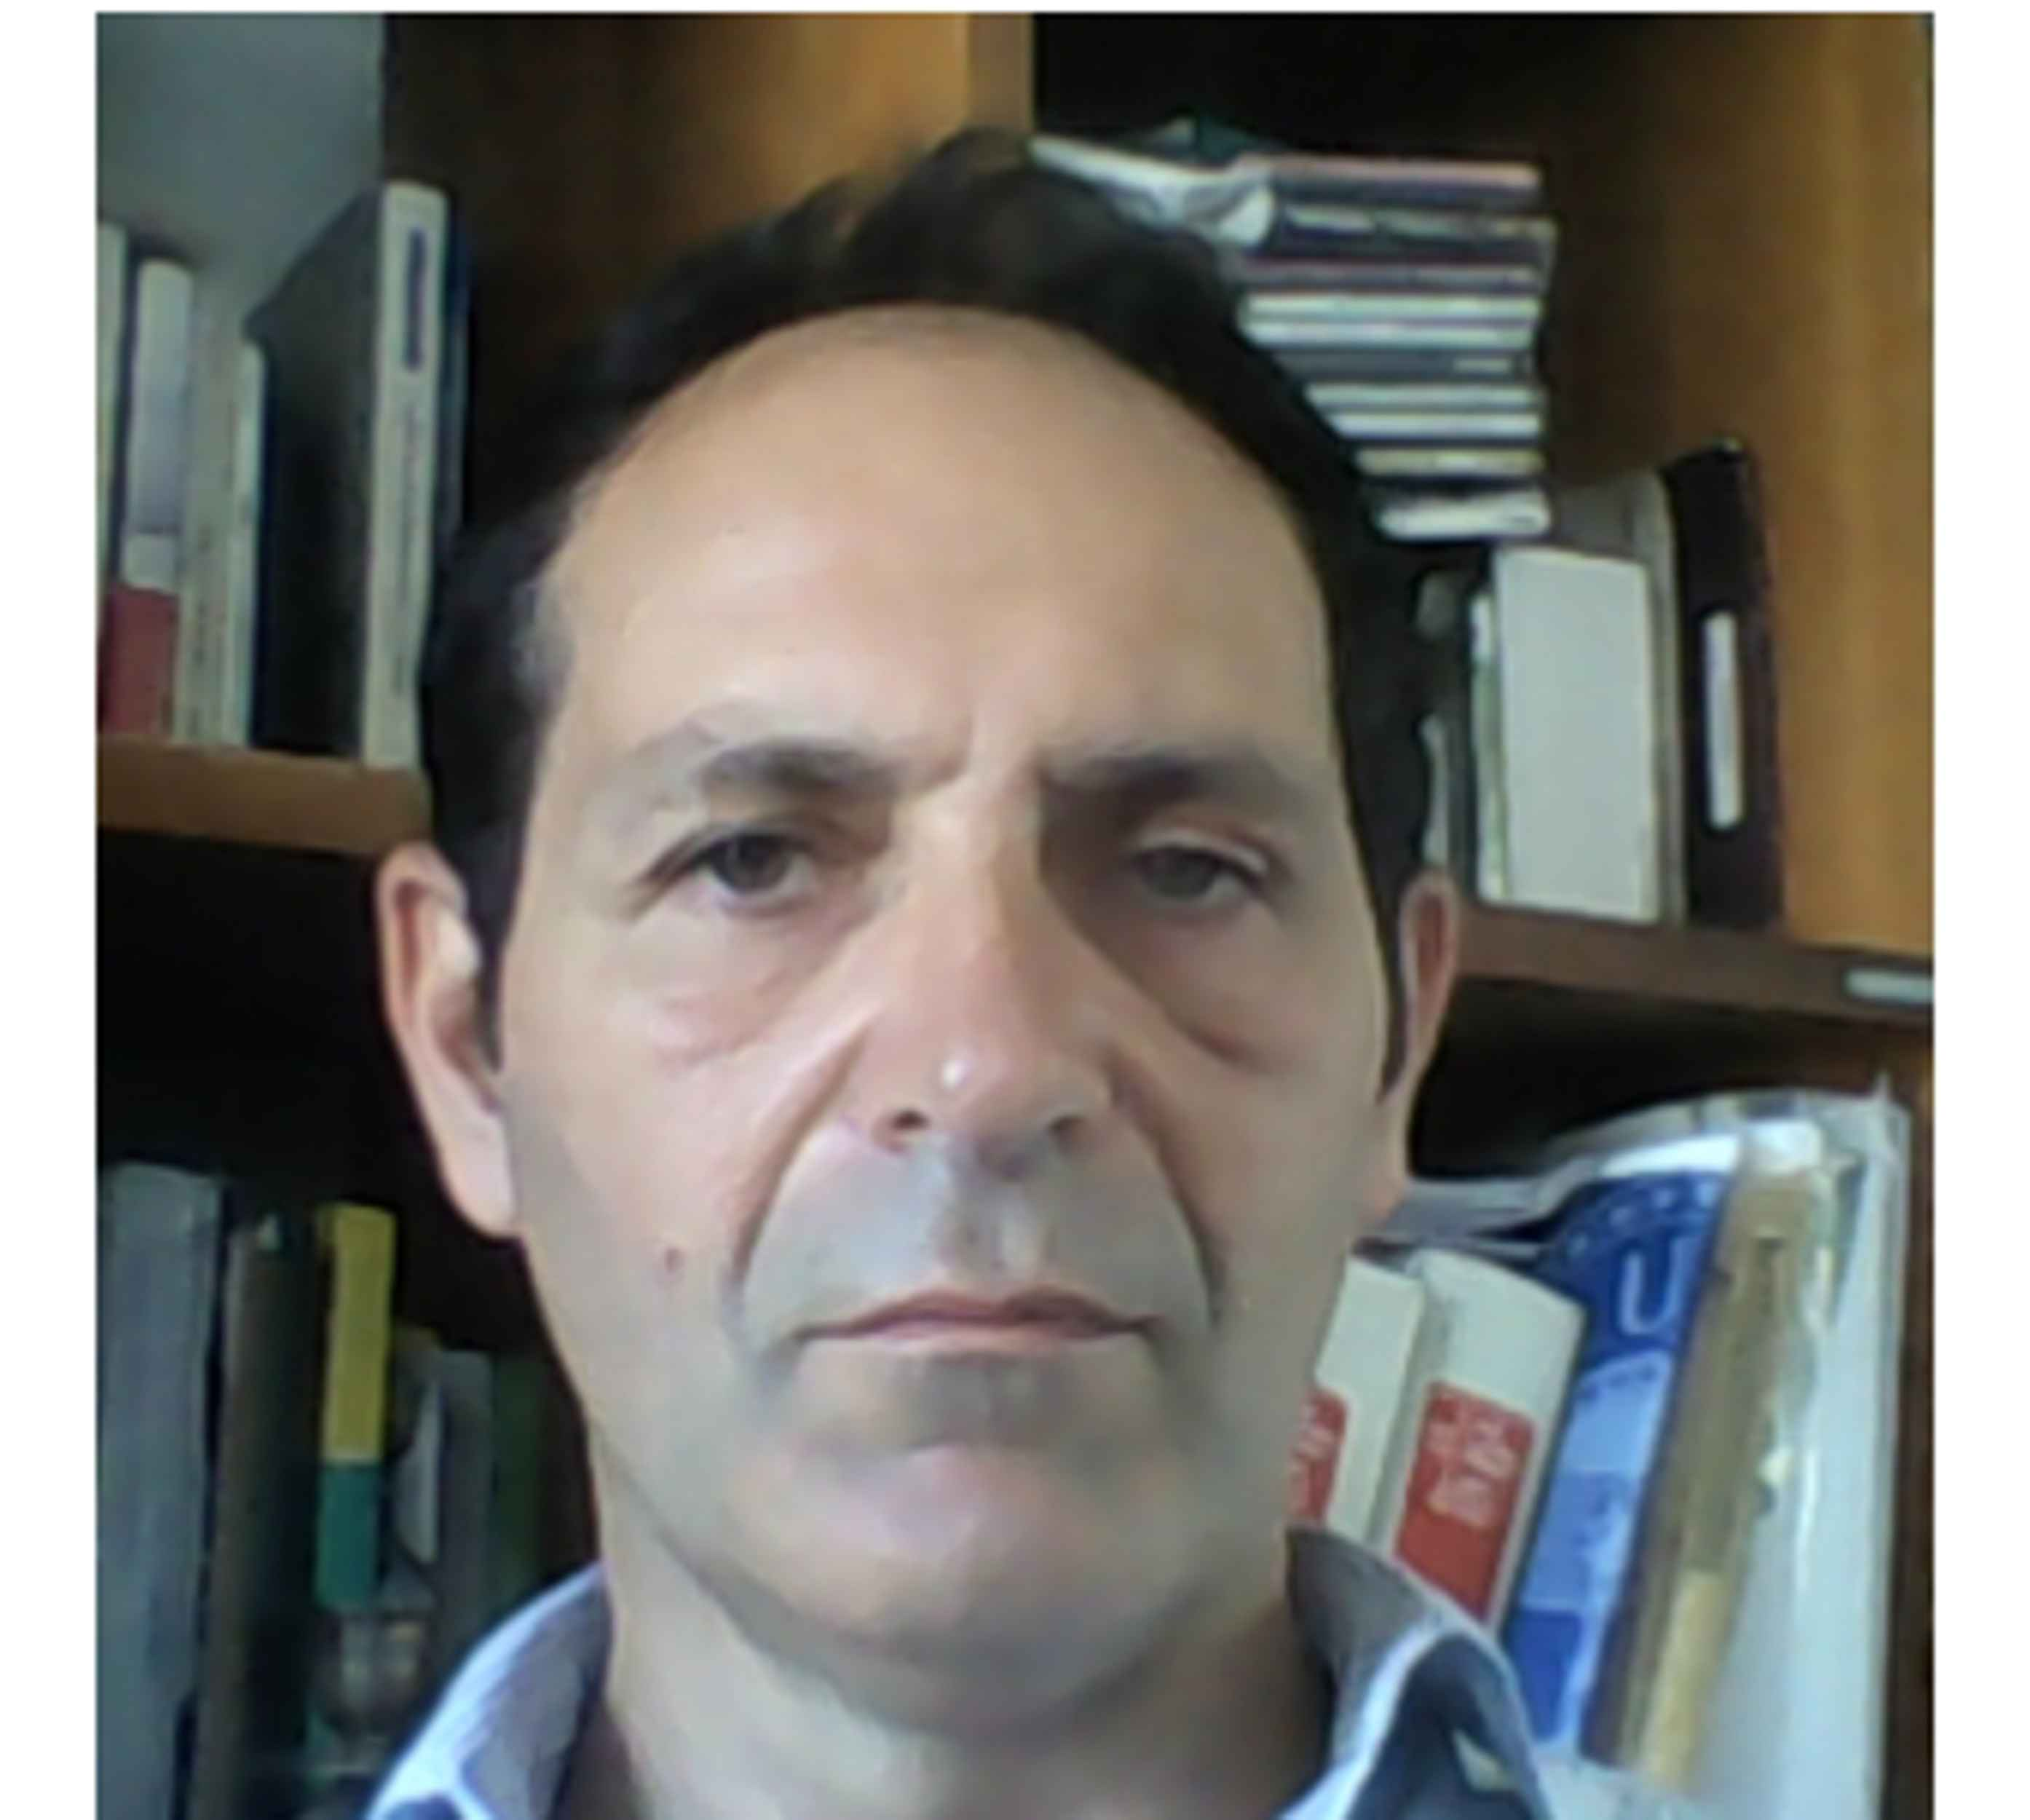 Dott. Silvio Fedele